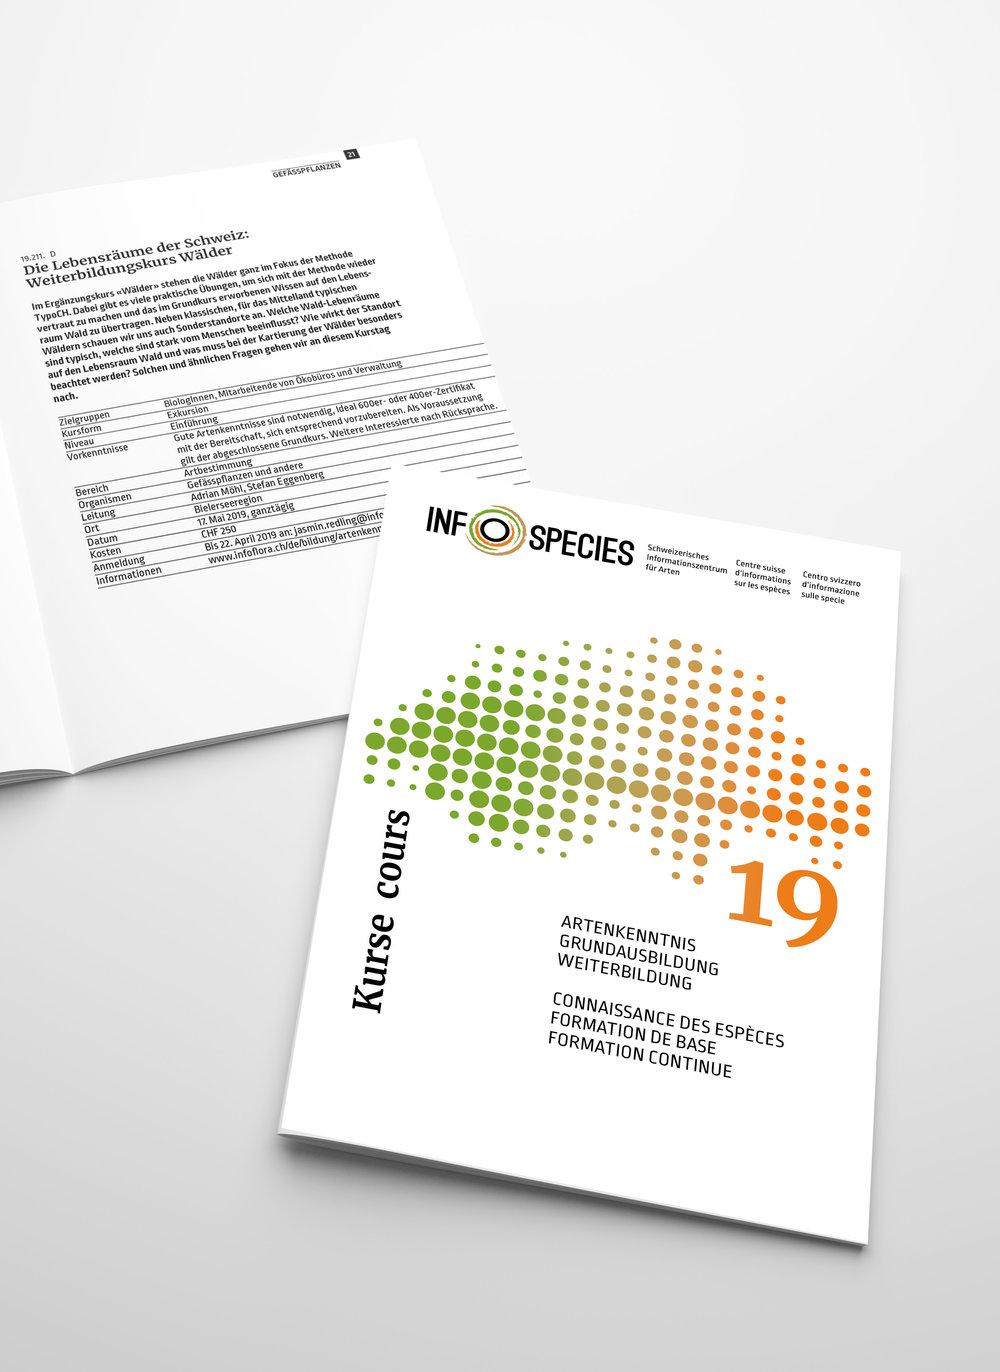 INFOSPECIES - Projektkoordination: Irene Küenzle, Co-LeiterinRedesign Gesamtauftritt: Christian Jaberg, jaberg.designWebsite:Ralph Thielen, Info Florawww.infospecies.chKursprogramm